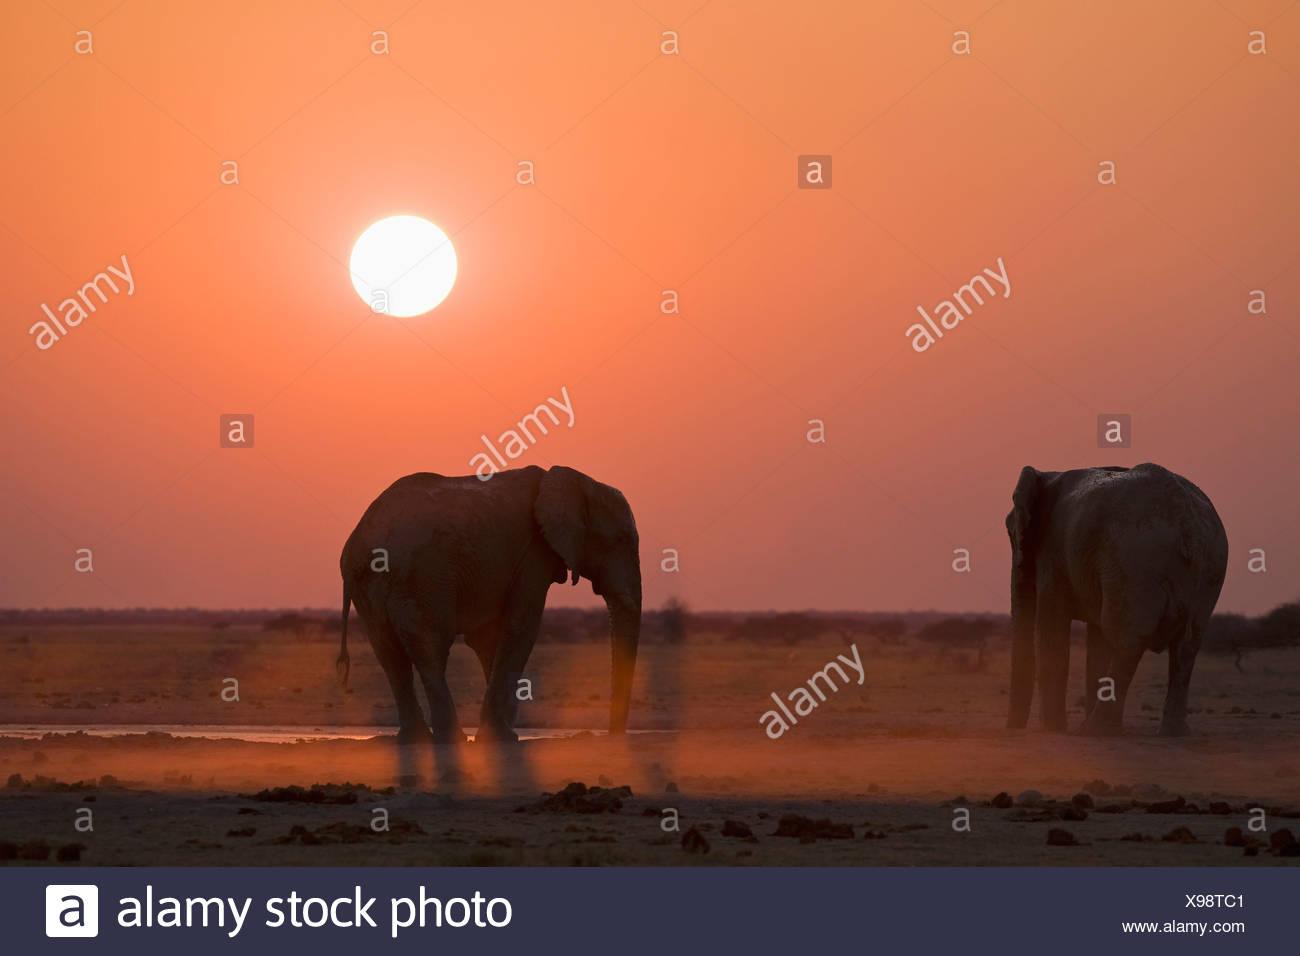 Africa, Sambia, African elephants (Loxodonta africana) - Stock Image